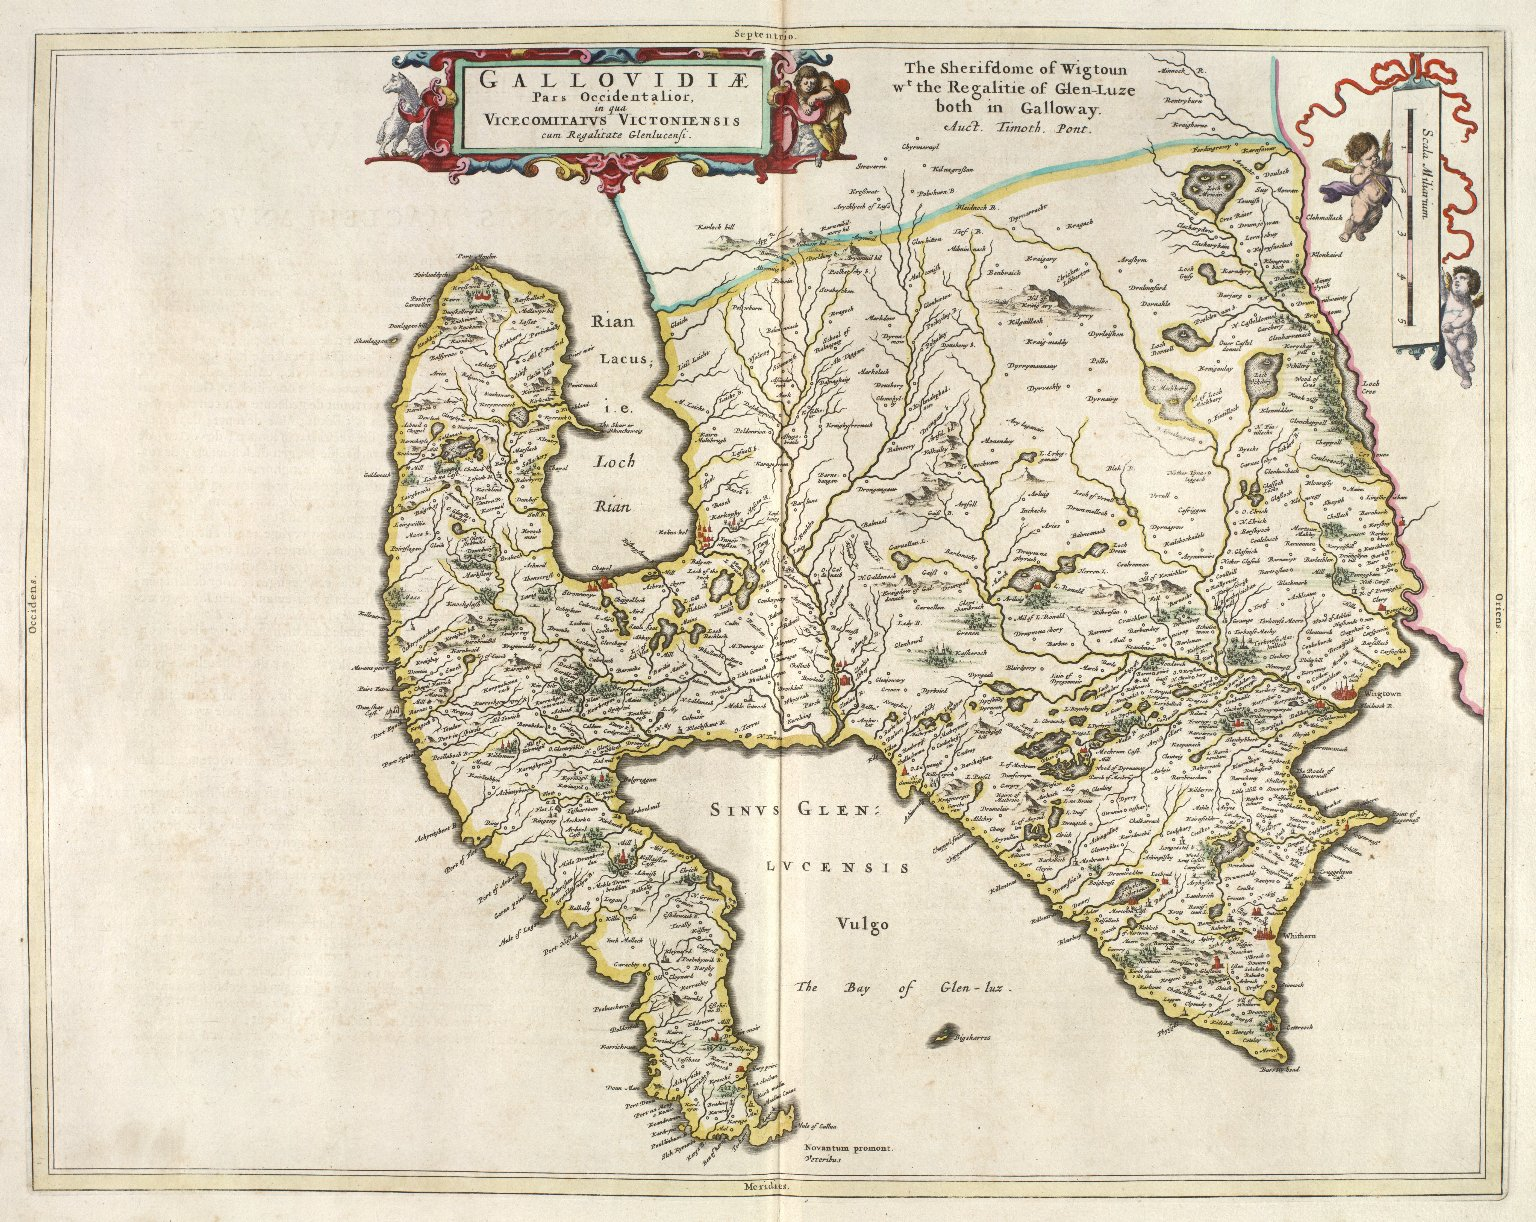 [Geographiae Blavianae] [Also known as: Atlas major] [054 of 153]